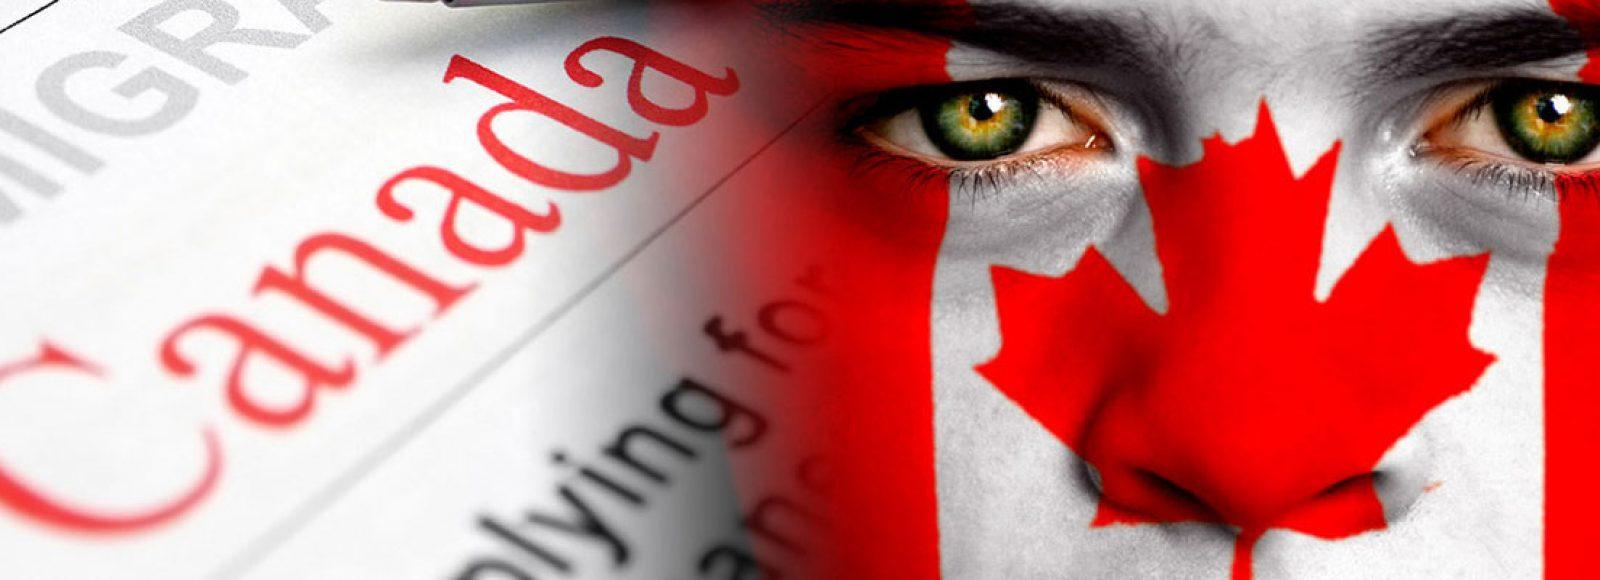 اخذ ویزای کانادا در کوتاهترین زمان  Getting Canadian Visa in Shortest Time